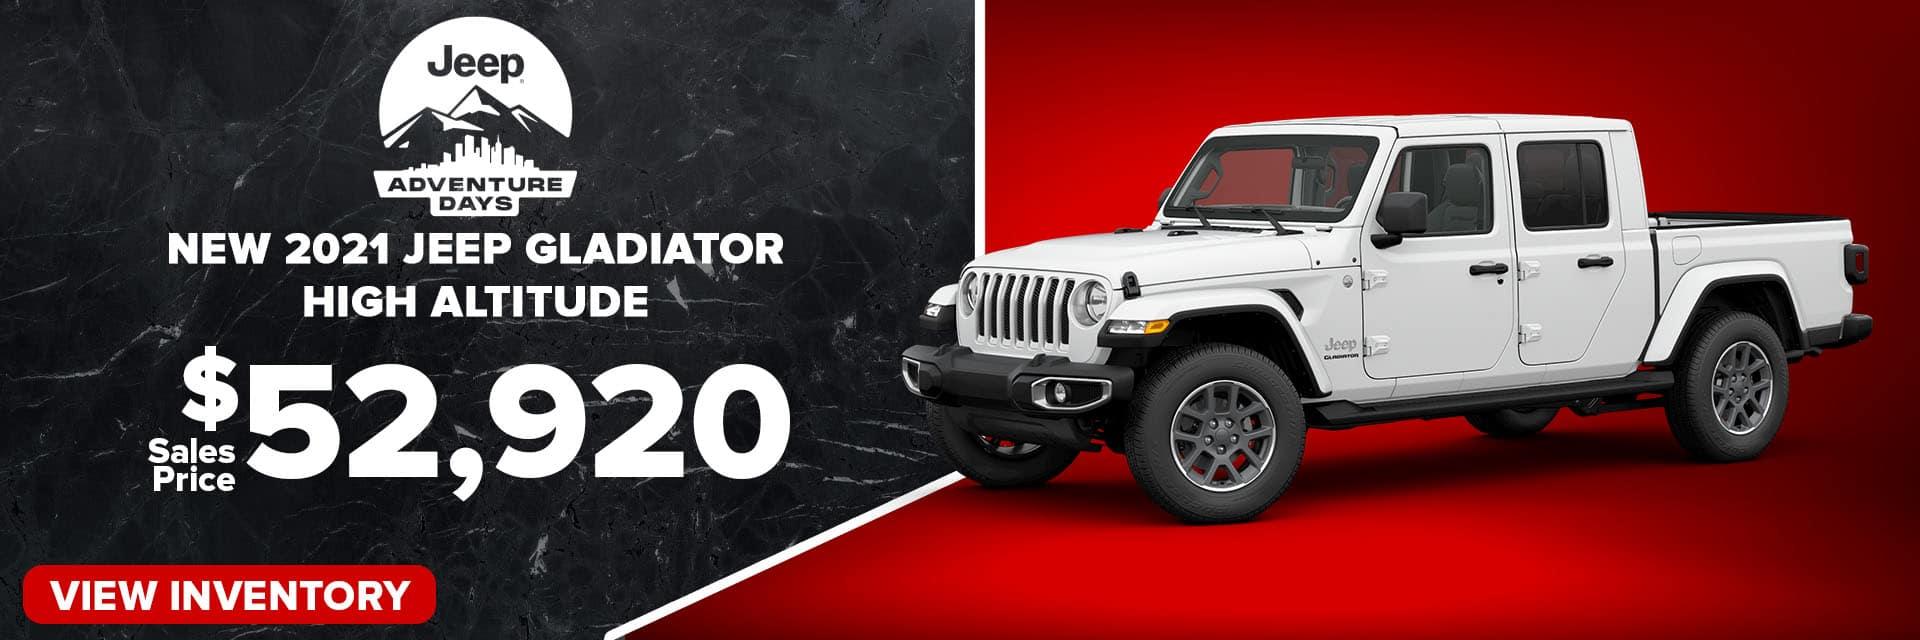 SLCJ-September 2021-2021 Jeep Gladiator copy